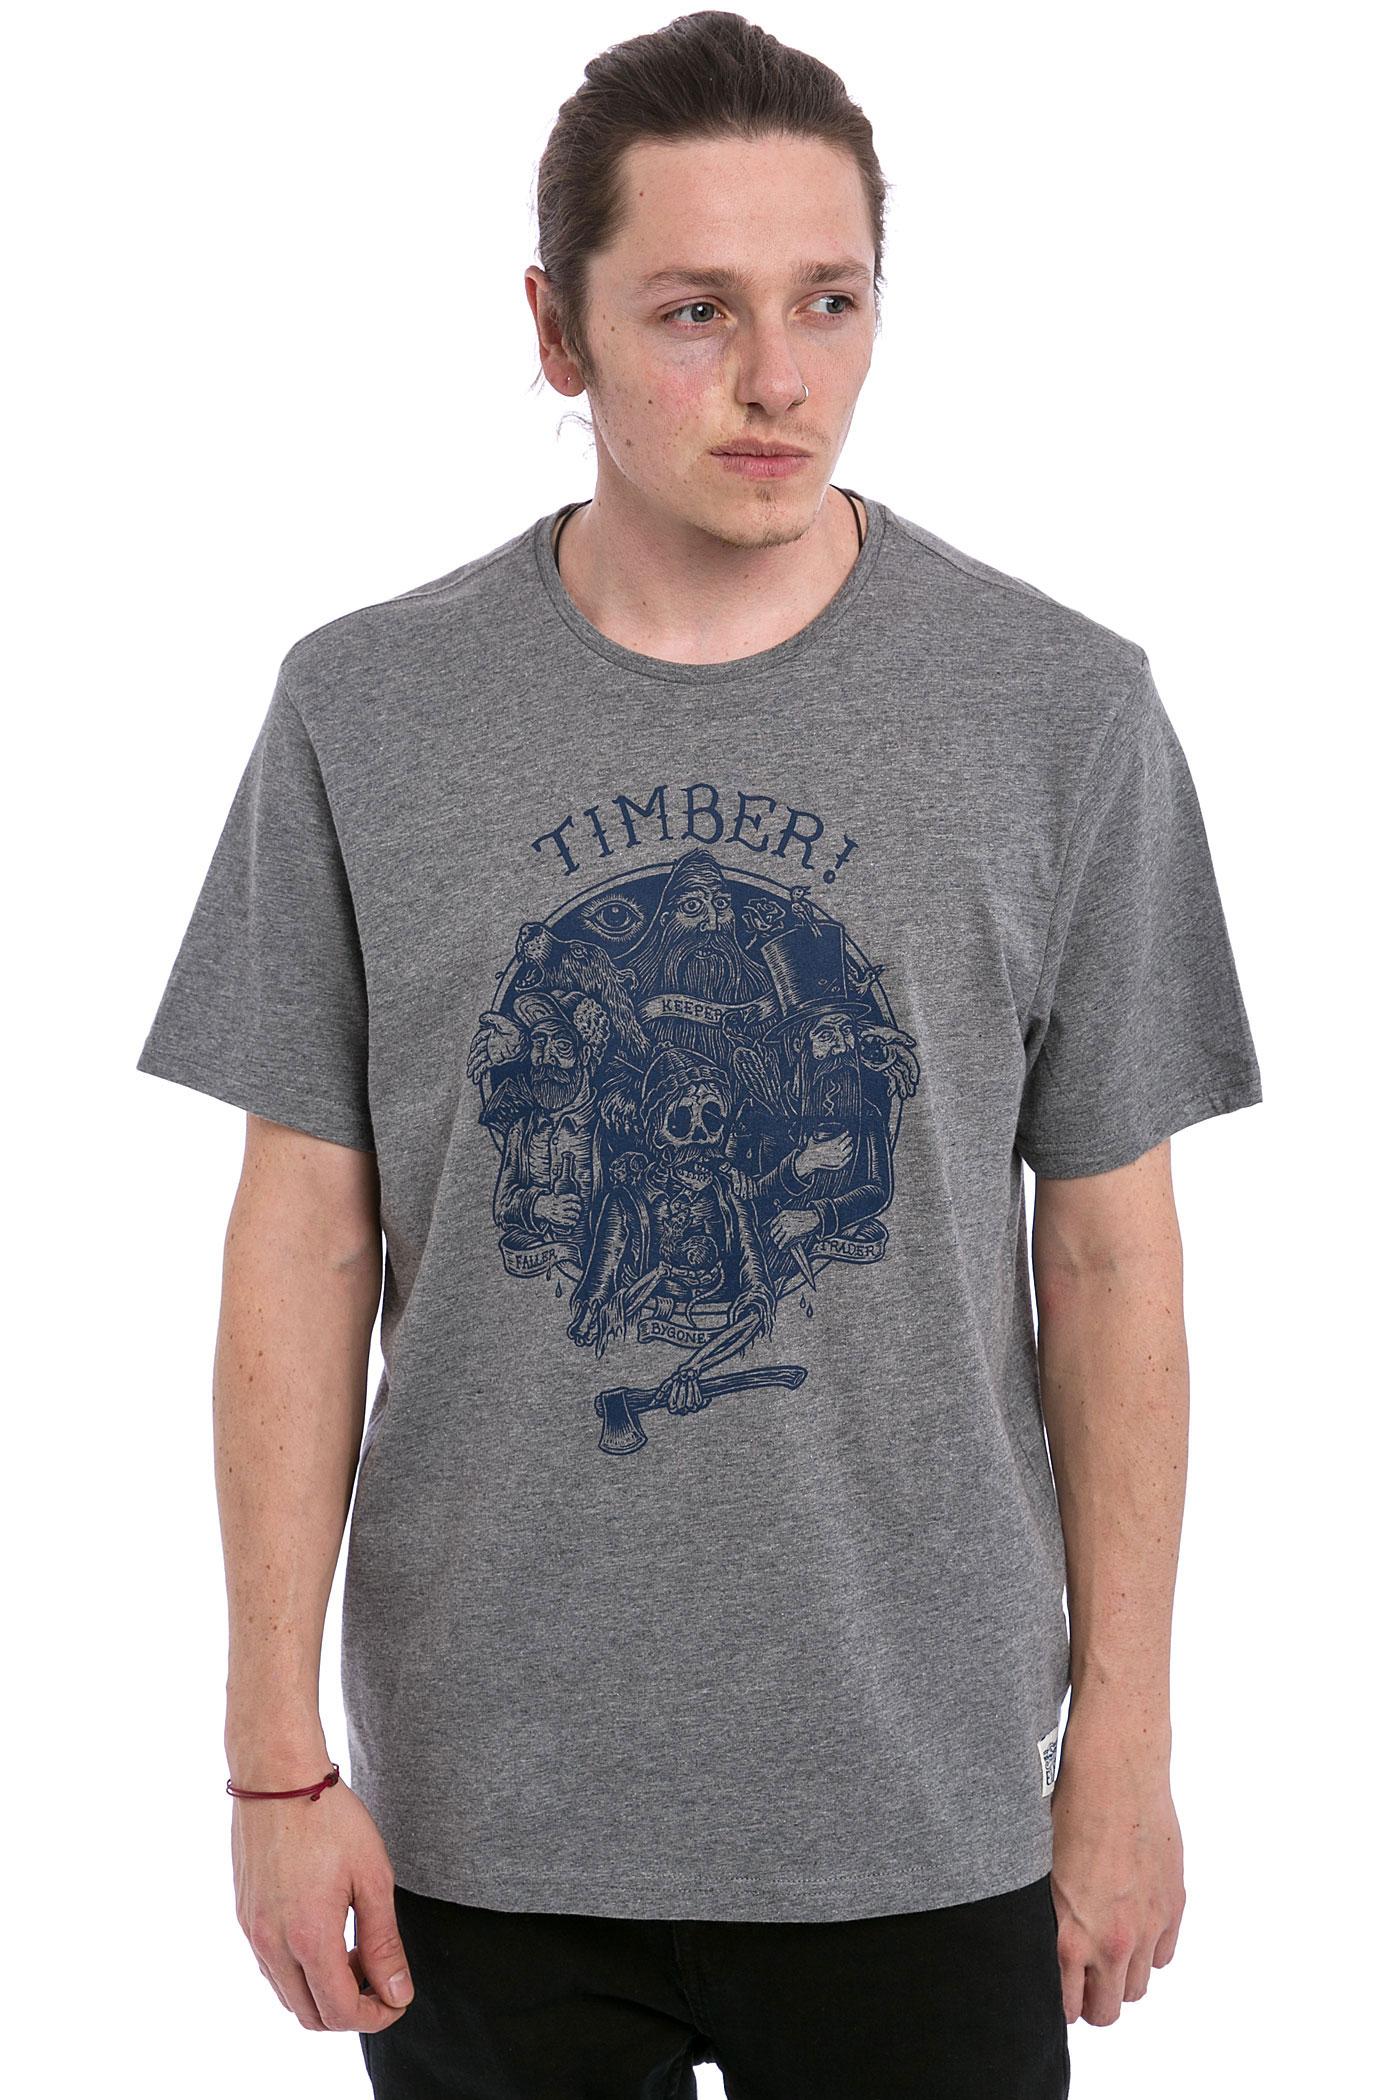 element x timber family t shirt grey heather achetez. Black Bedroom Furniture Sets. Home Design Ideas